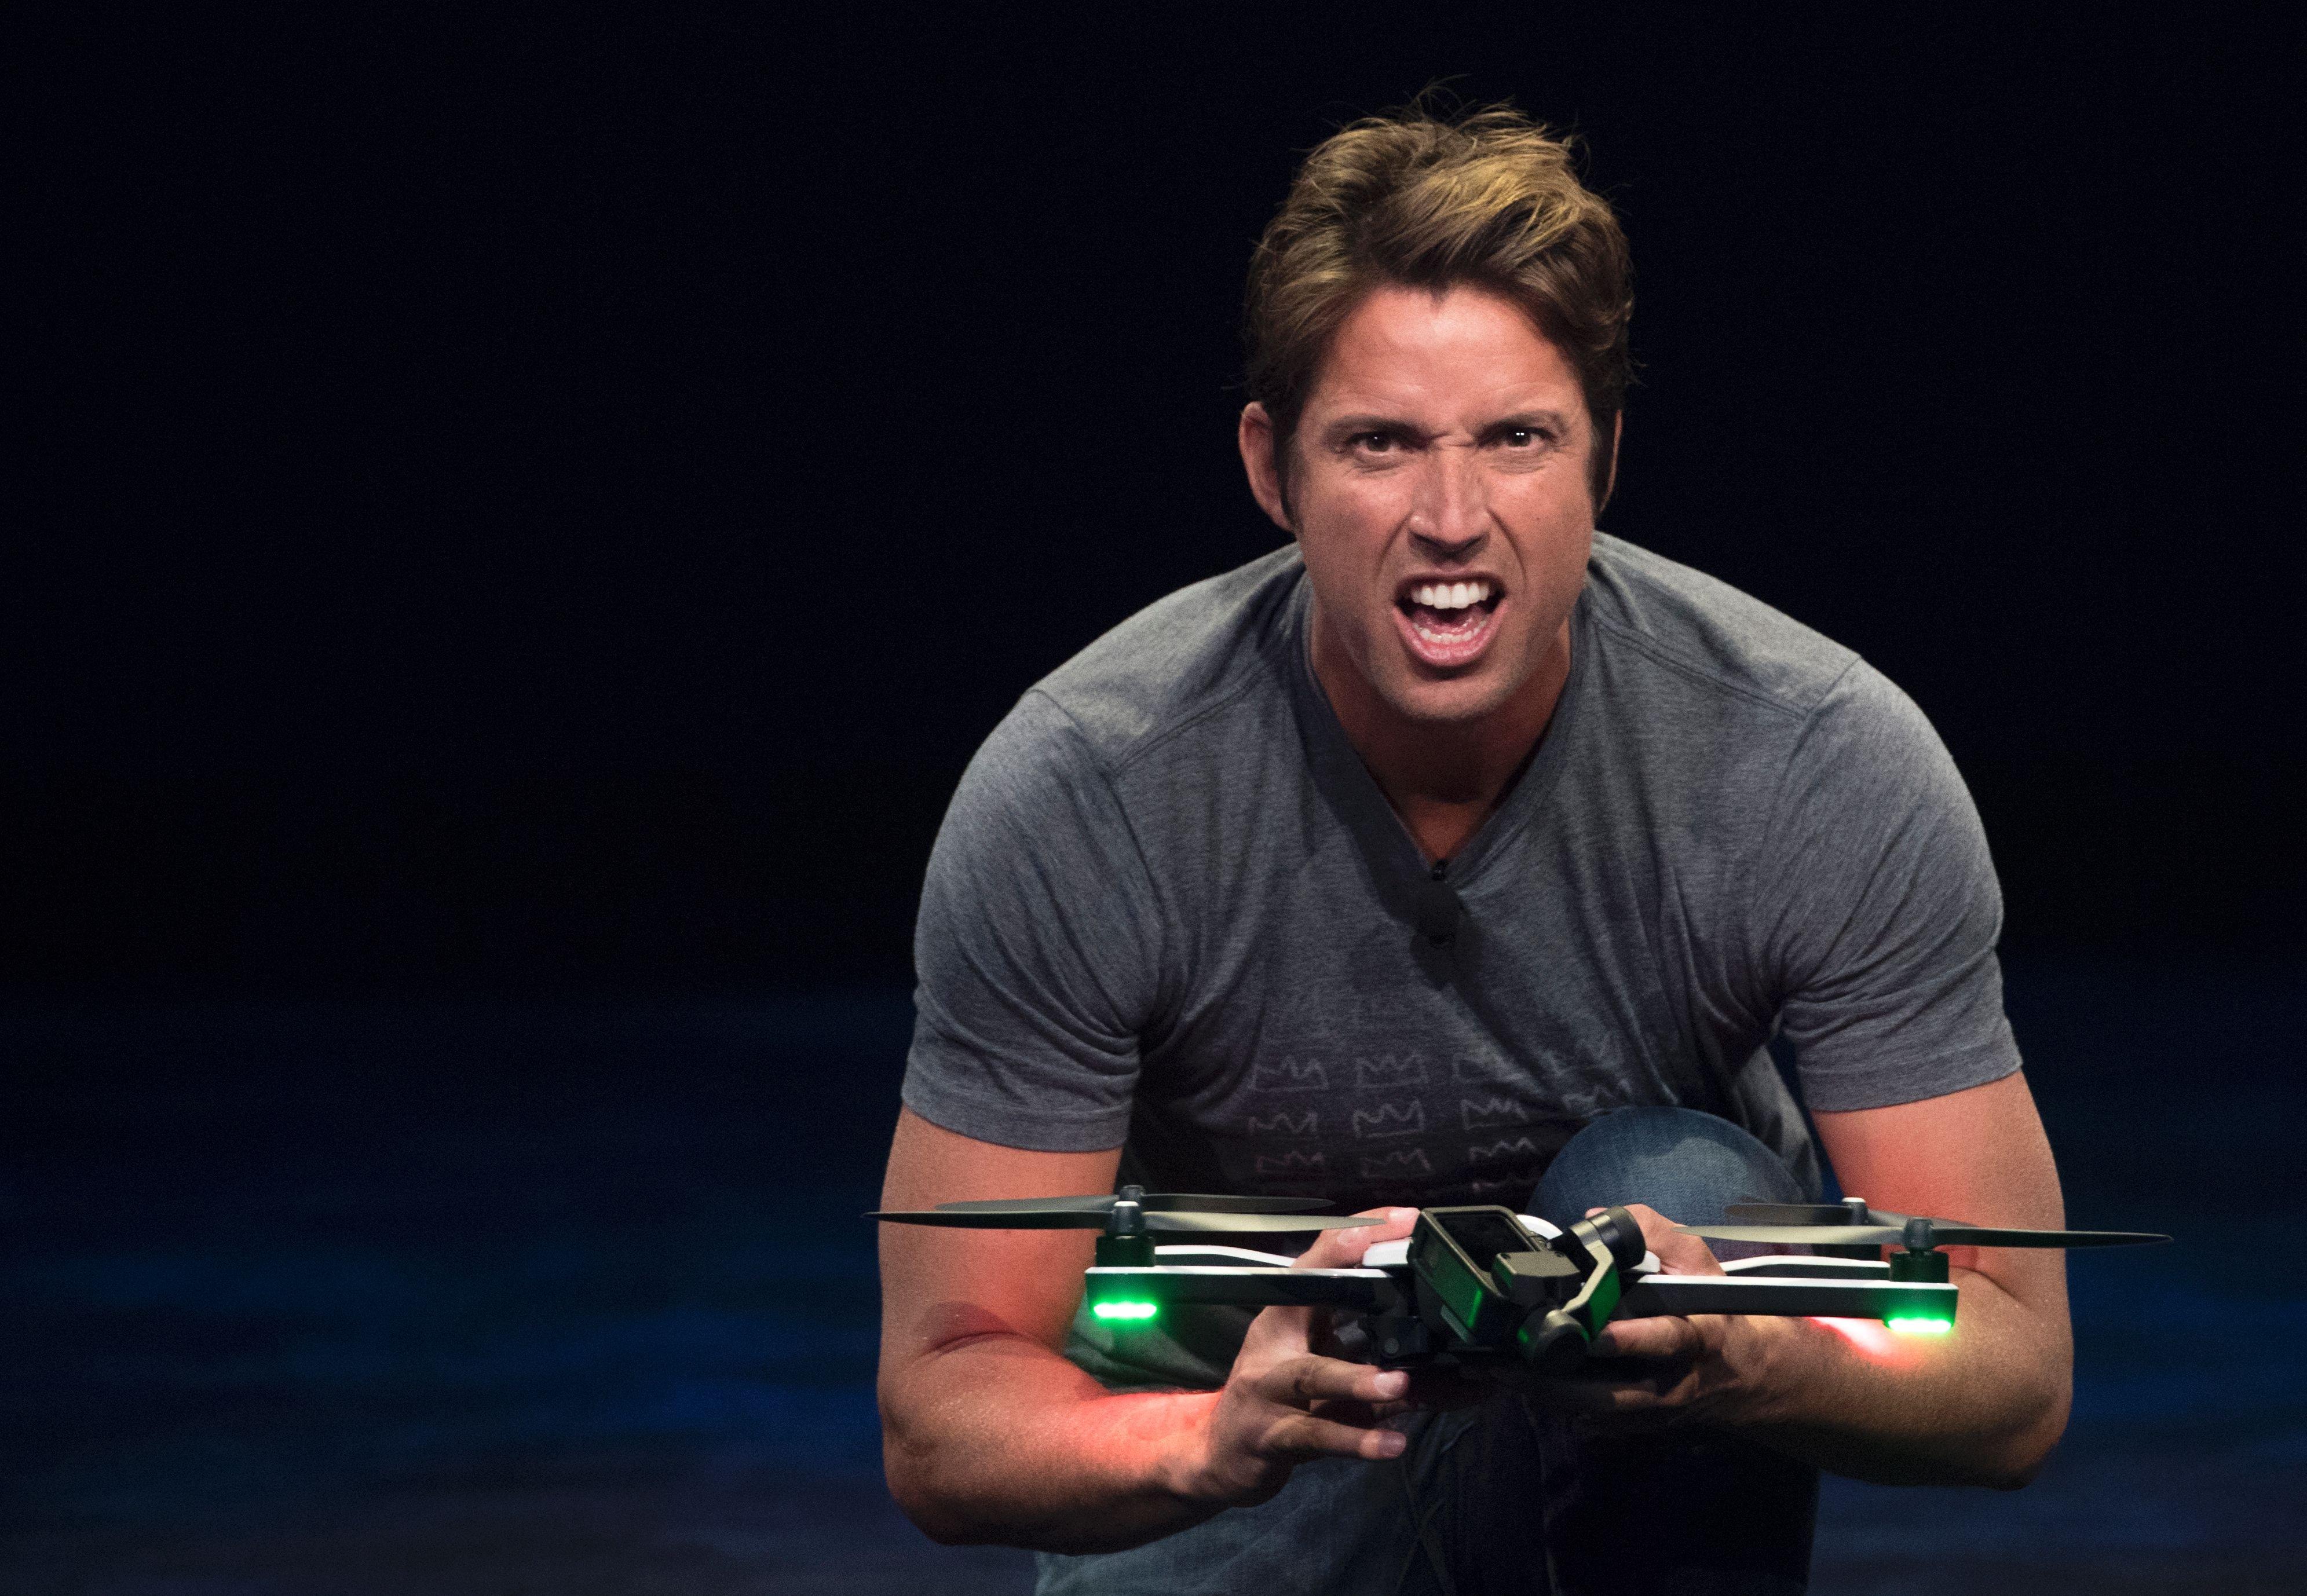 More bad news for GoPro Karma drone after hundreds of